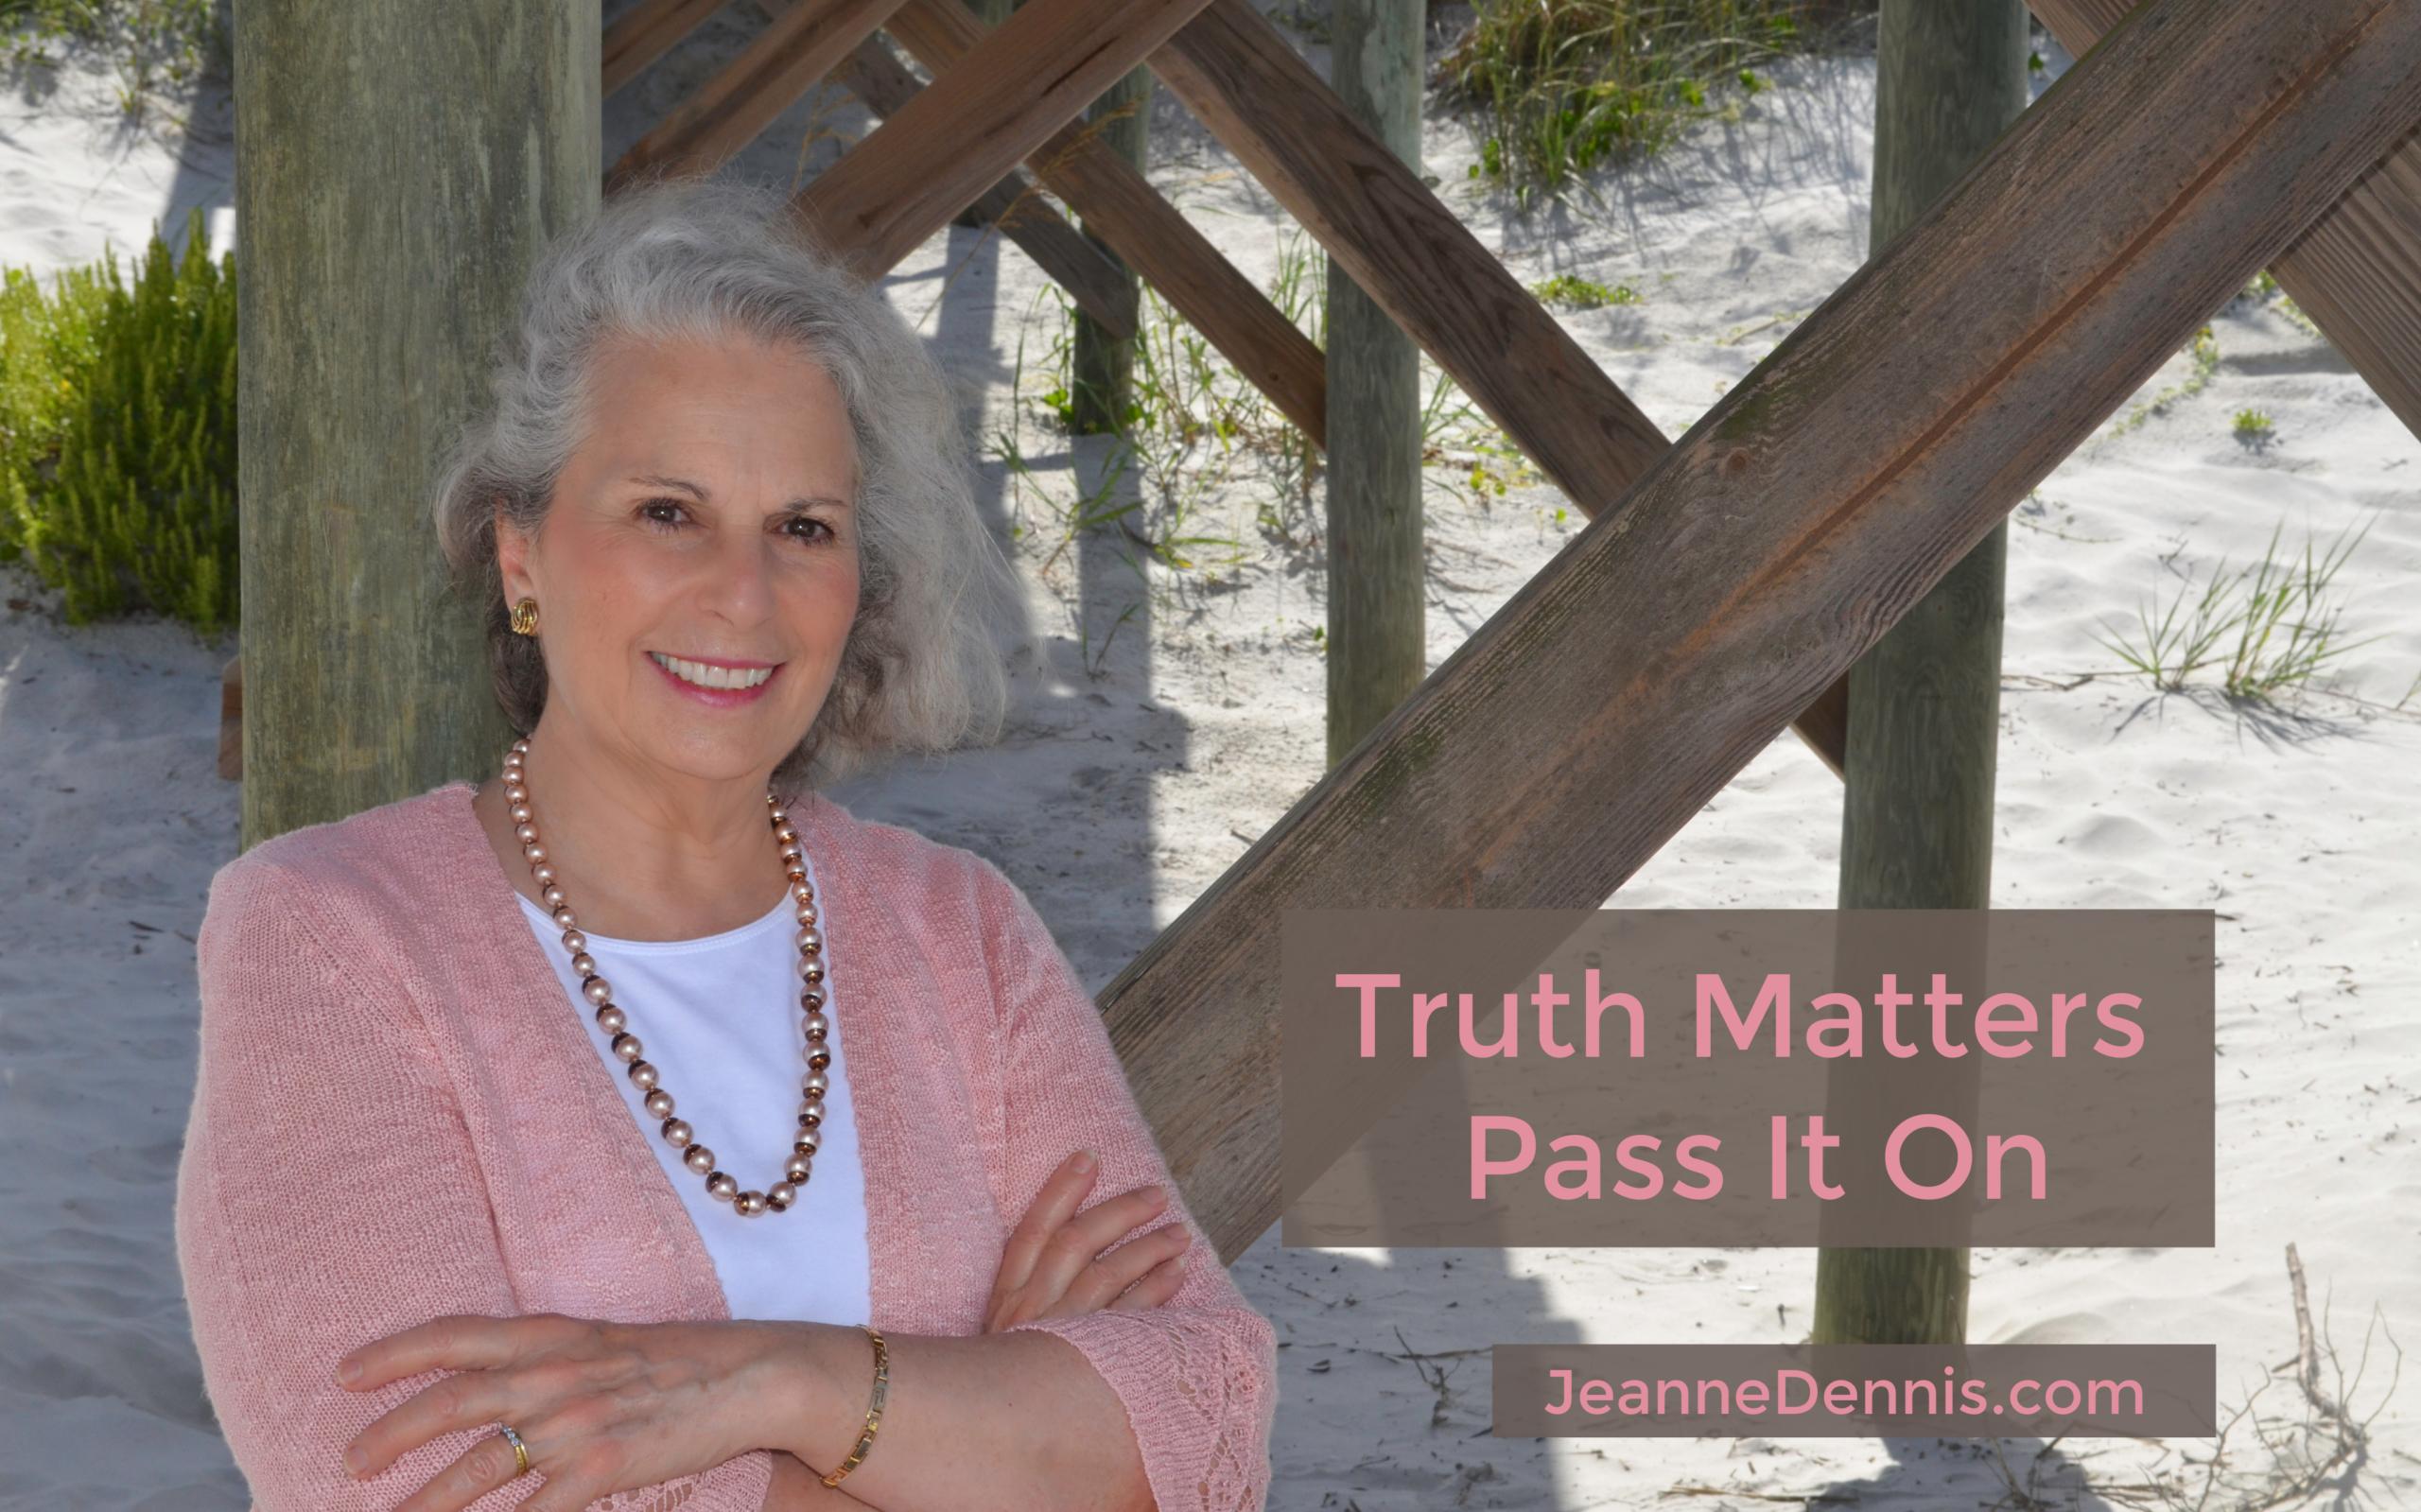 Jeanne Dennis, Truth Matters Pass It On, JeanneDennis.com